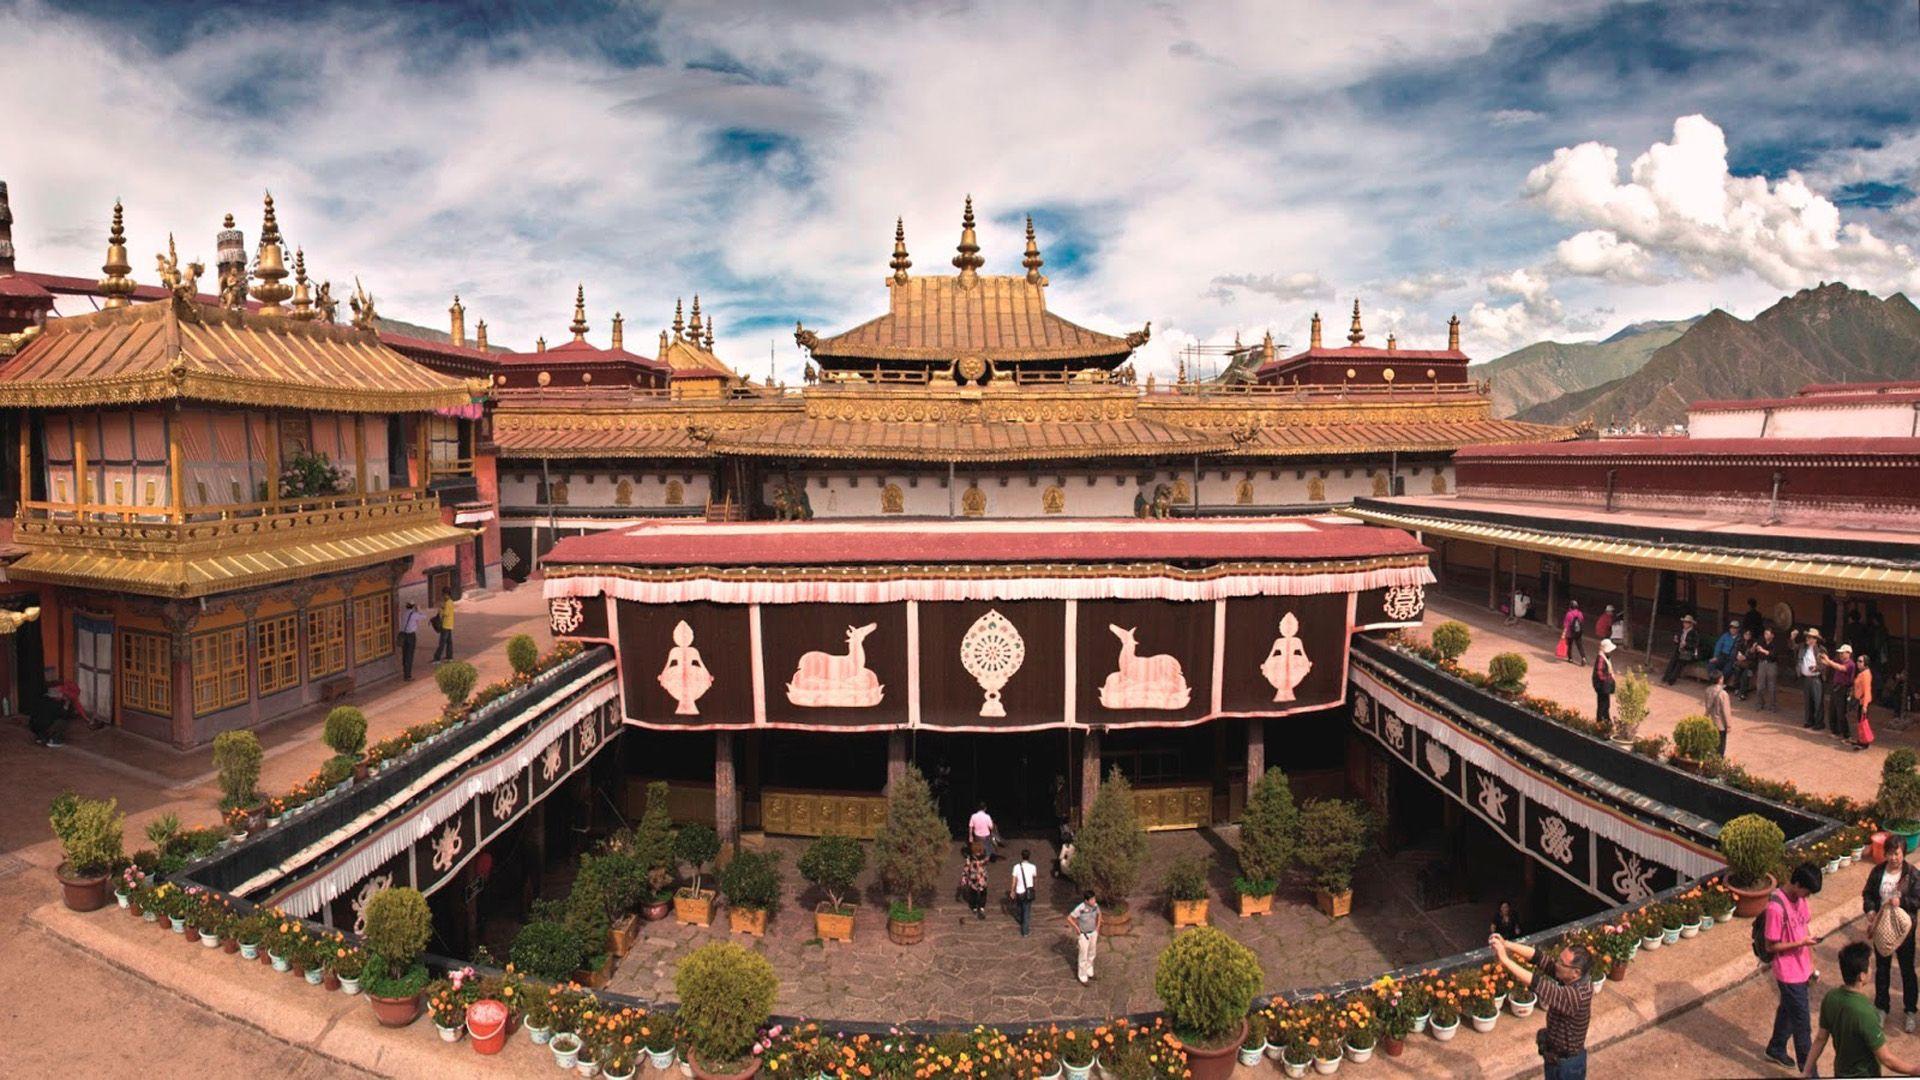 Jokhang Temple Lhasa Tibet China Tibet Unesco World Heritage Travel